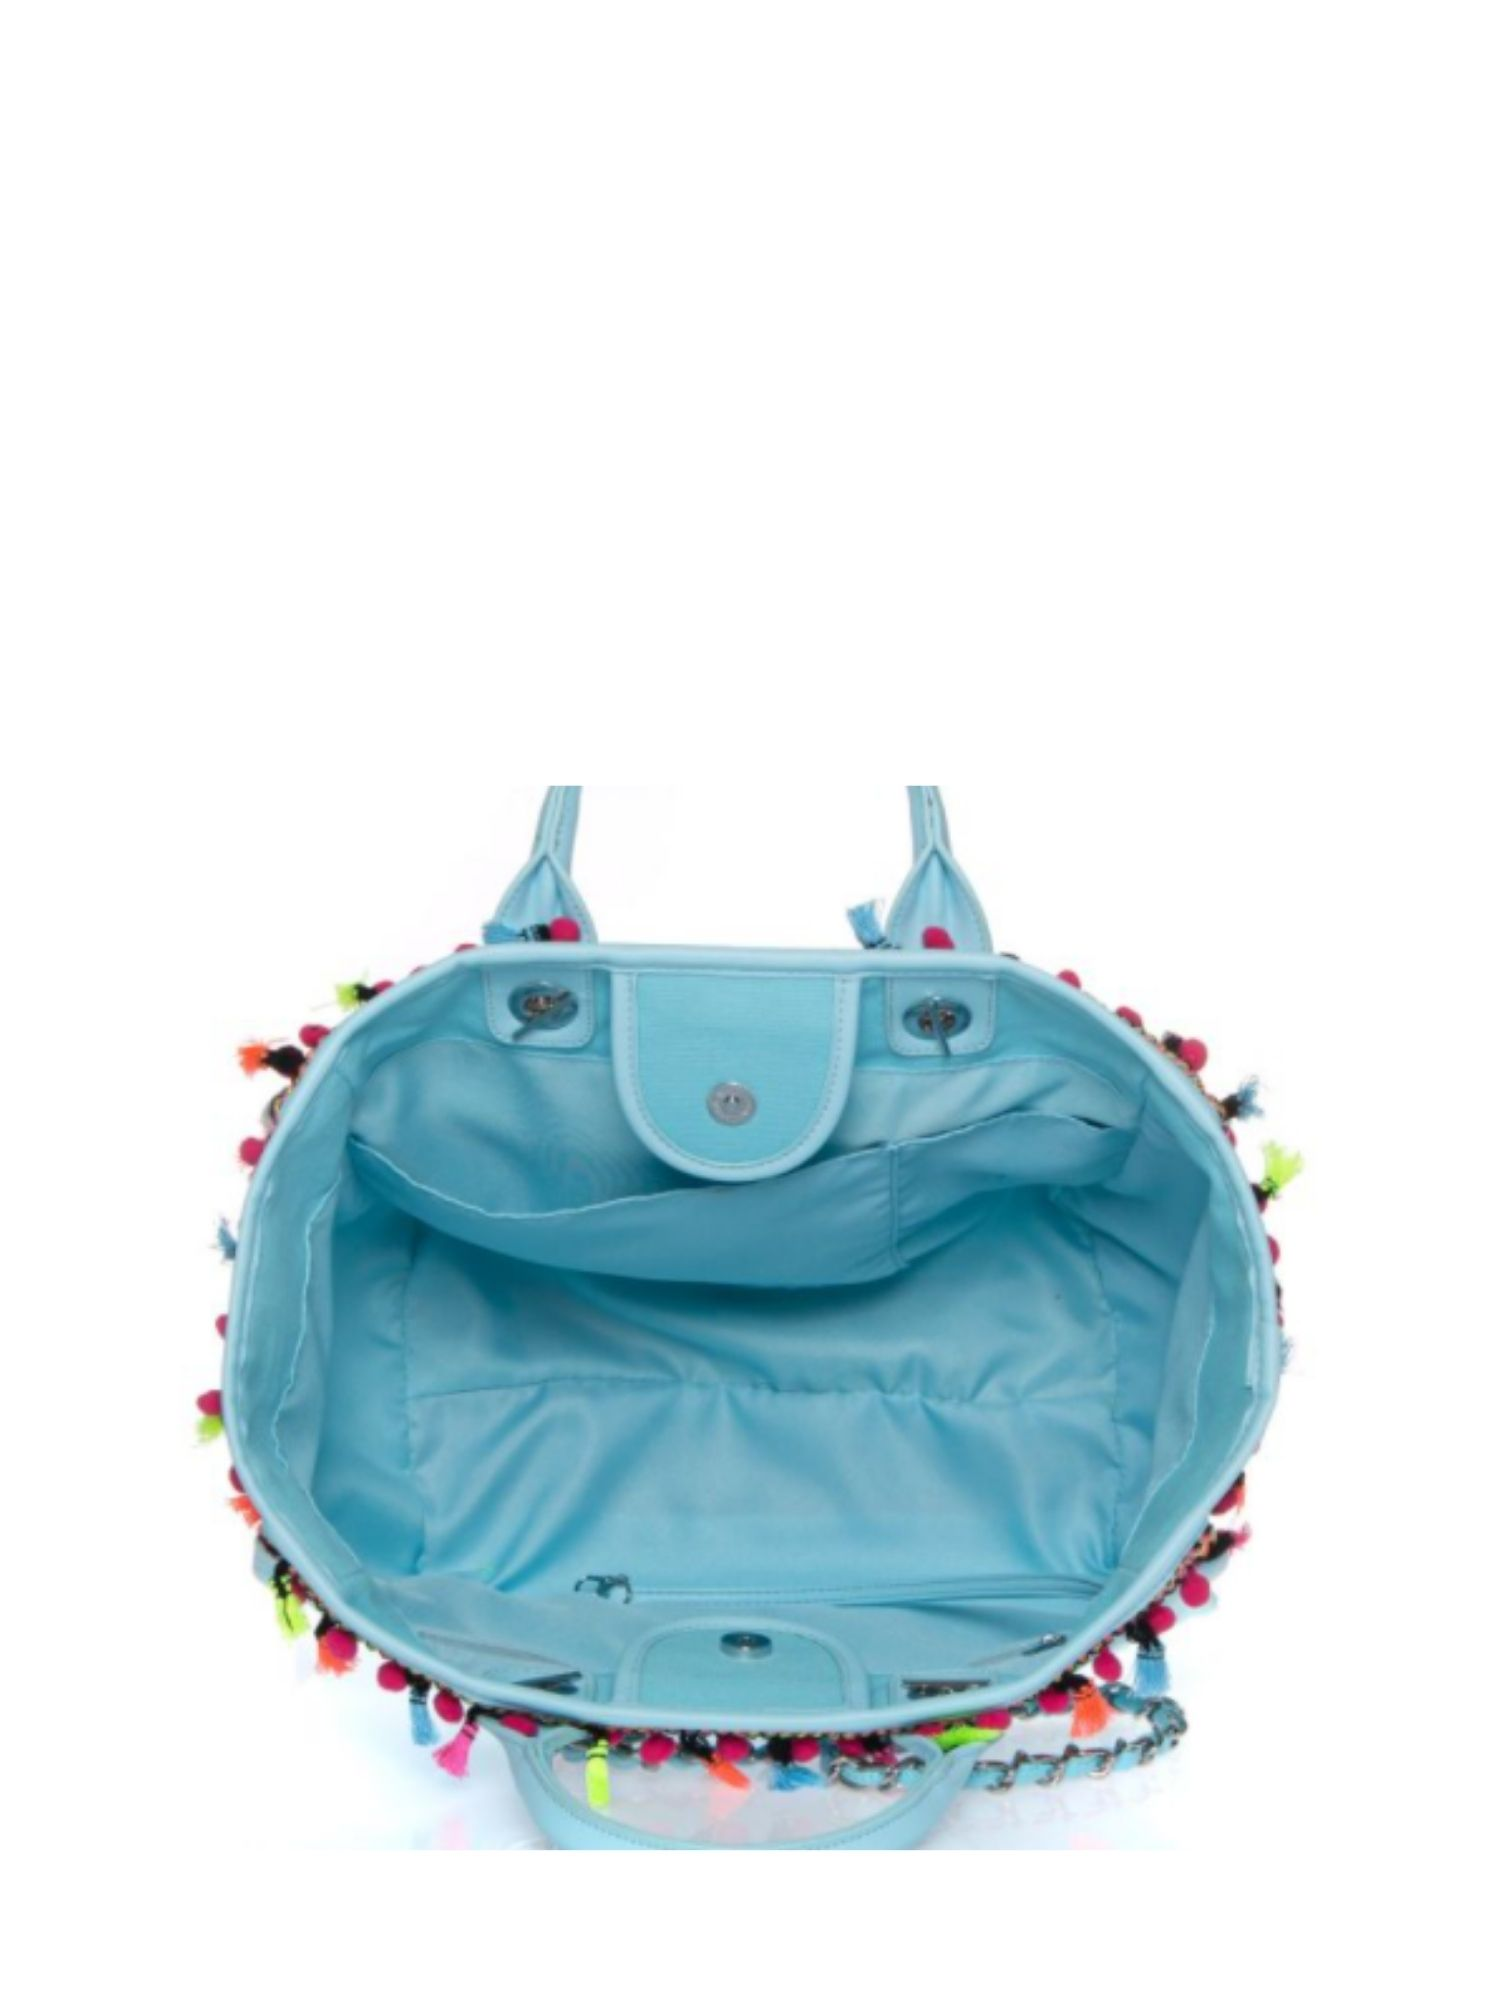 Borsa Atelier Du Sac Pash Bag 10999 Celeste 2